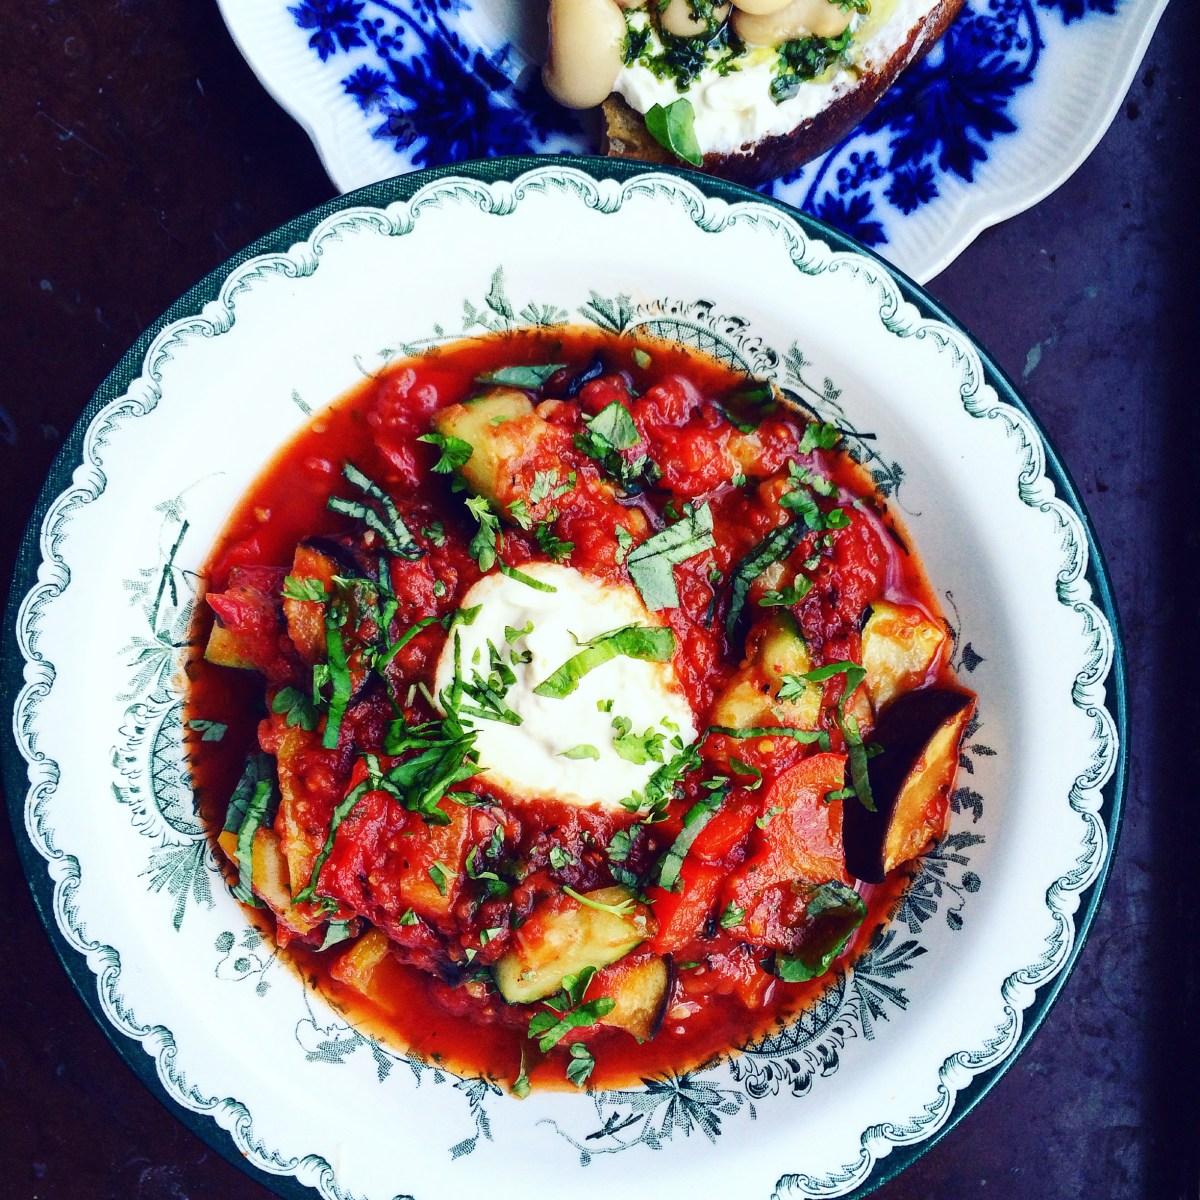 vegetarisk ratatouille med rostad aubergine och zucchini